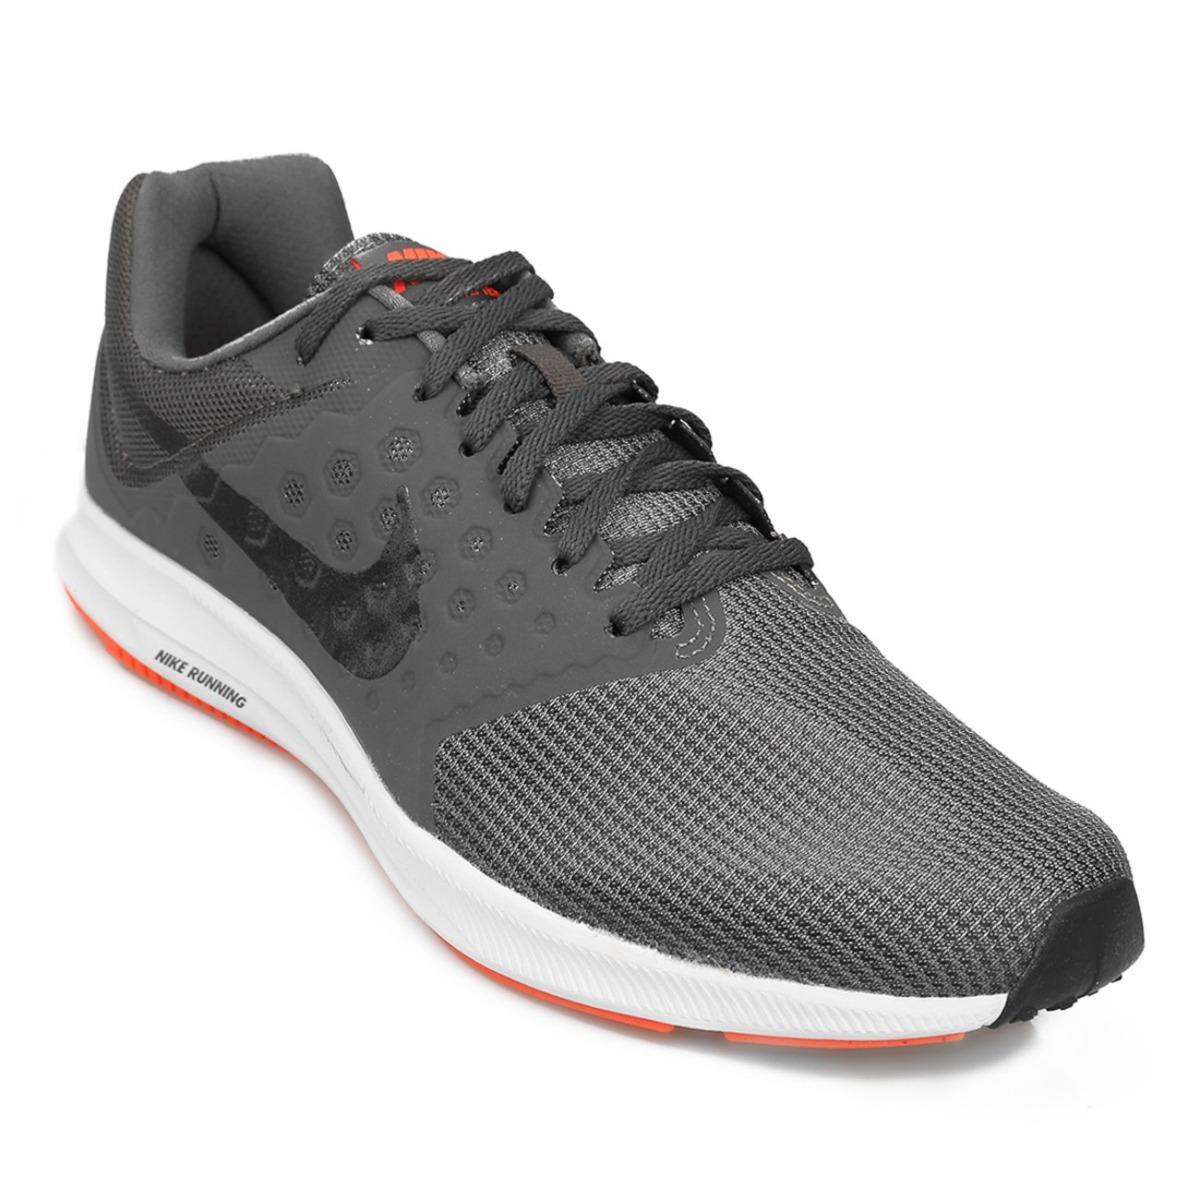 articulo Domar márketing  Nike Downshifter 7 Hombre GrisRojo